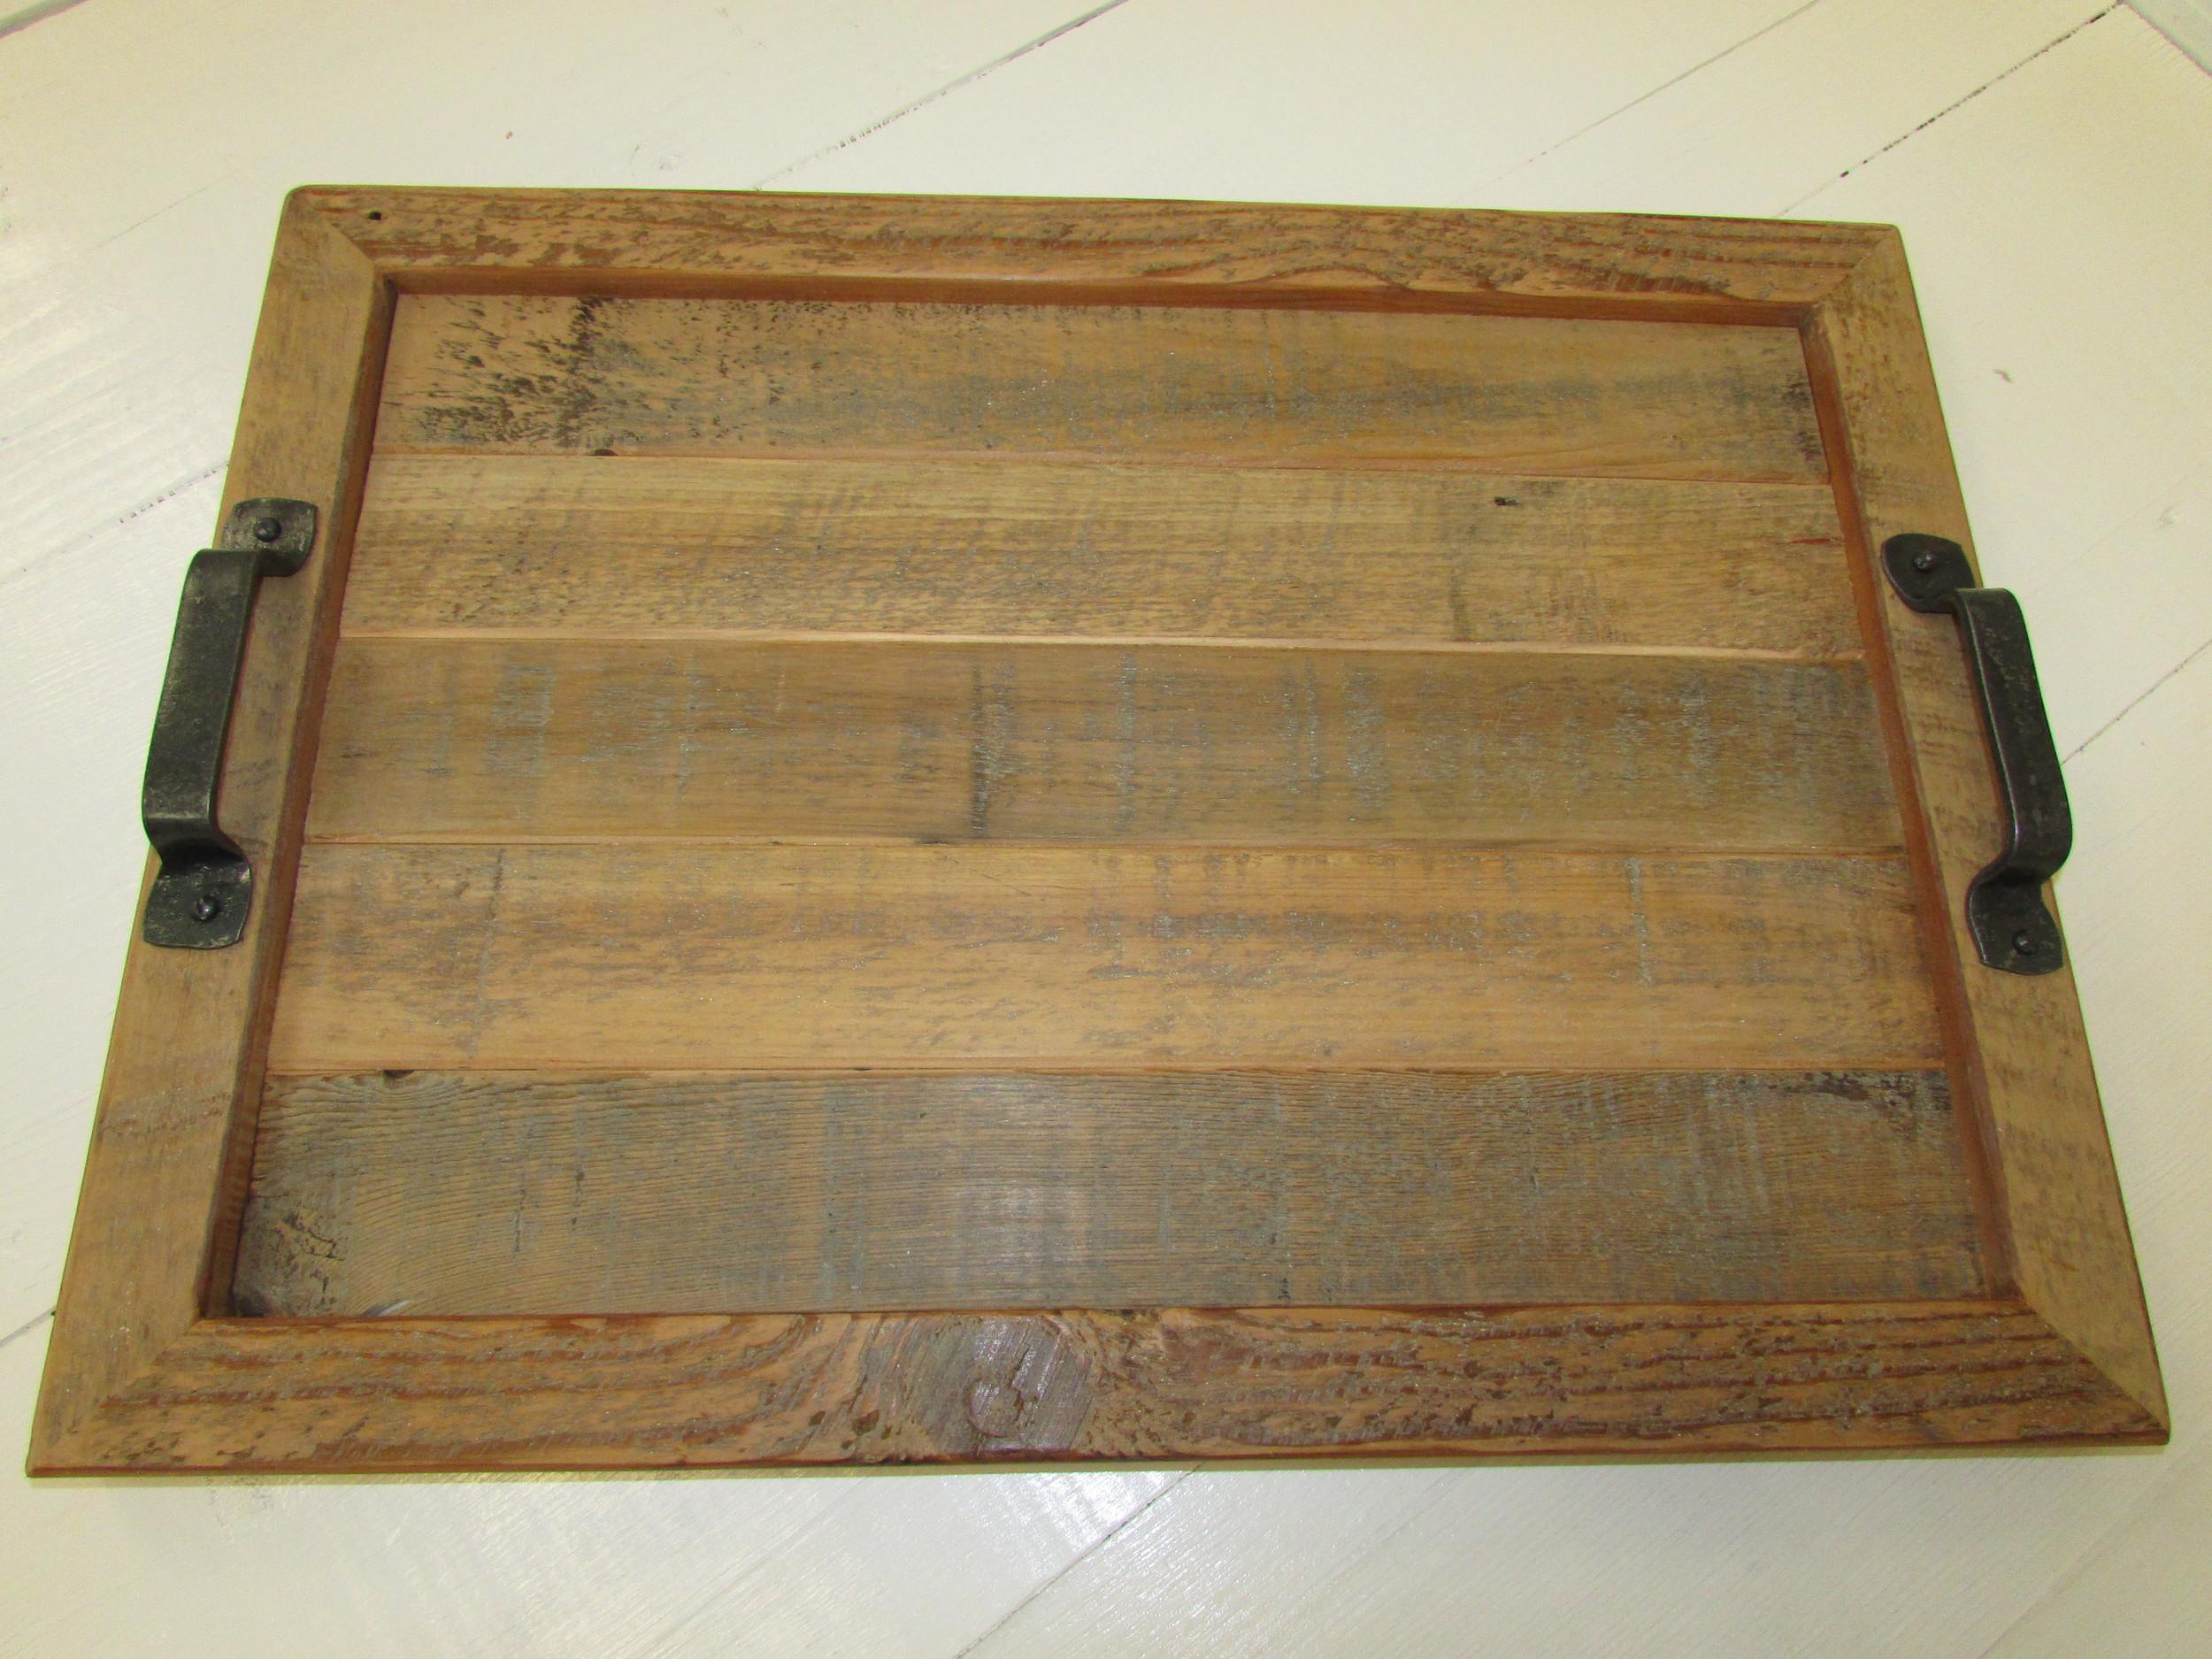 Barn Wood Tray.JPG